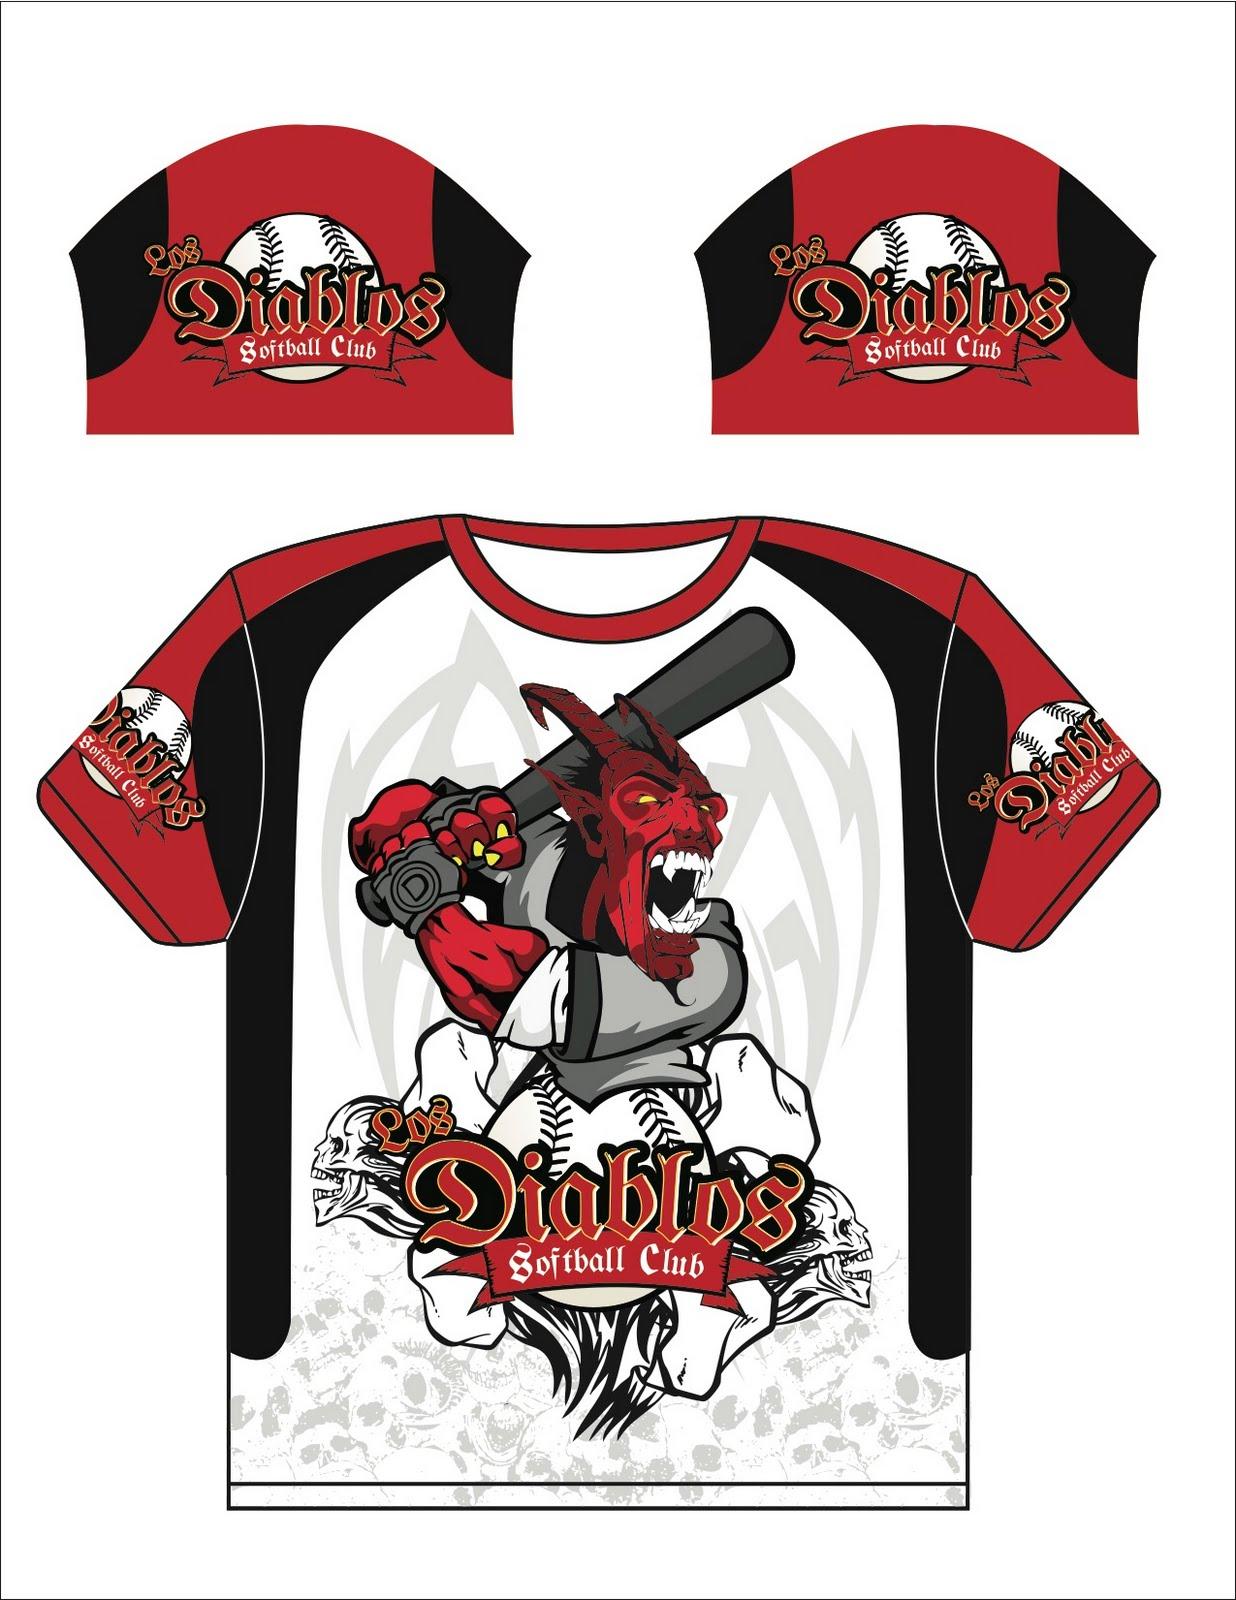 softball team logo designs los diablos softball jersey